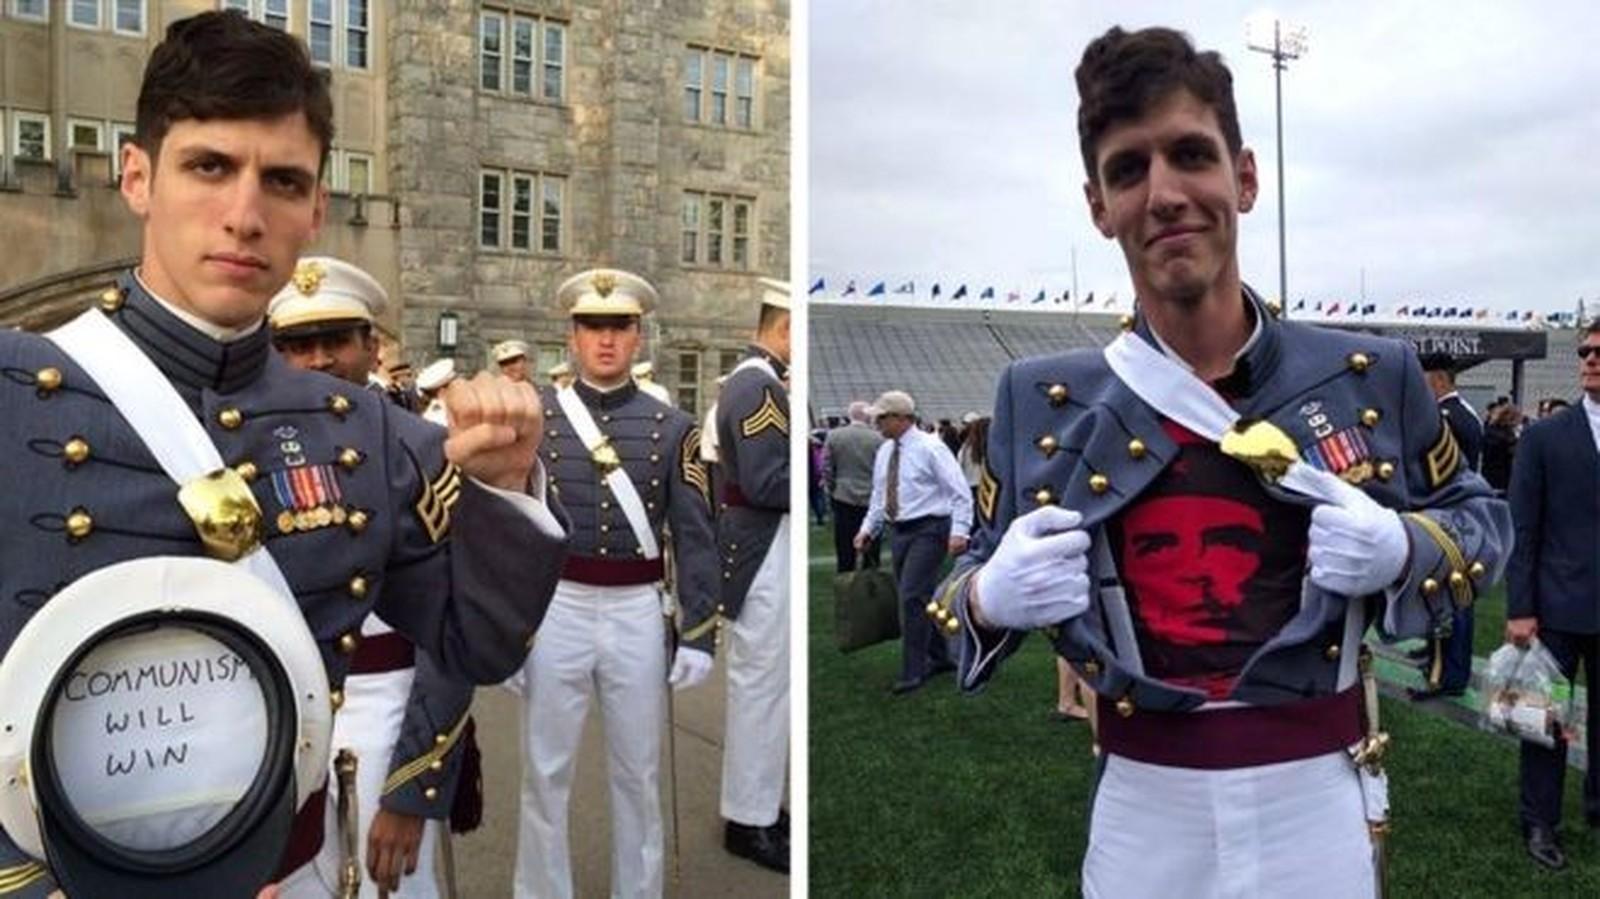 Corte de pelo tipo cadete